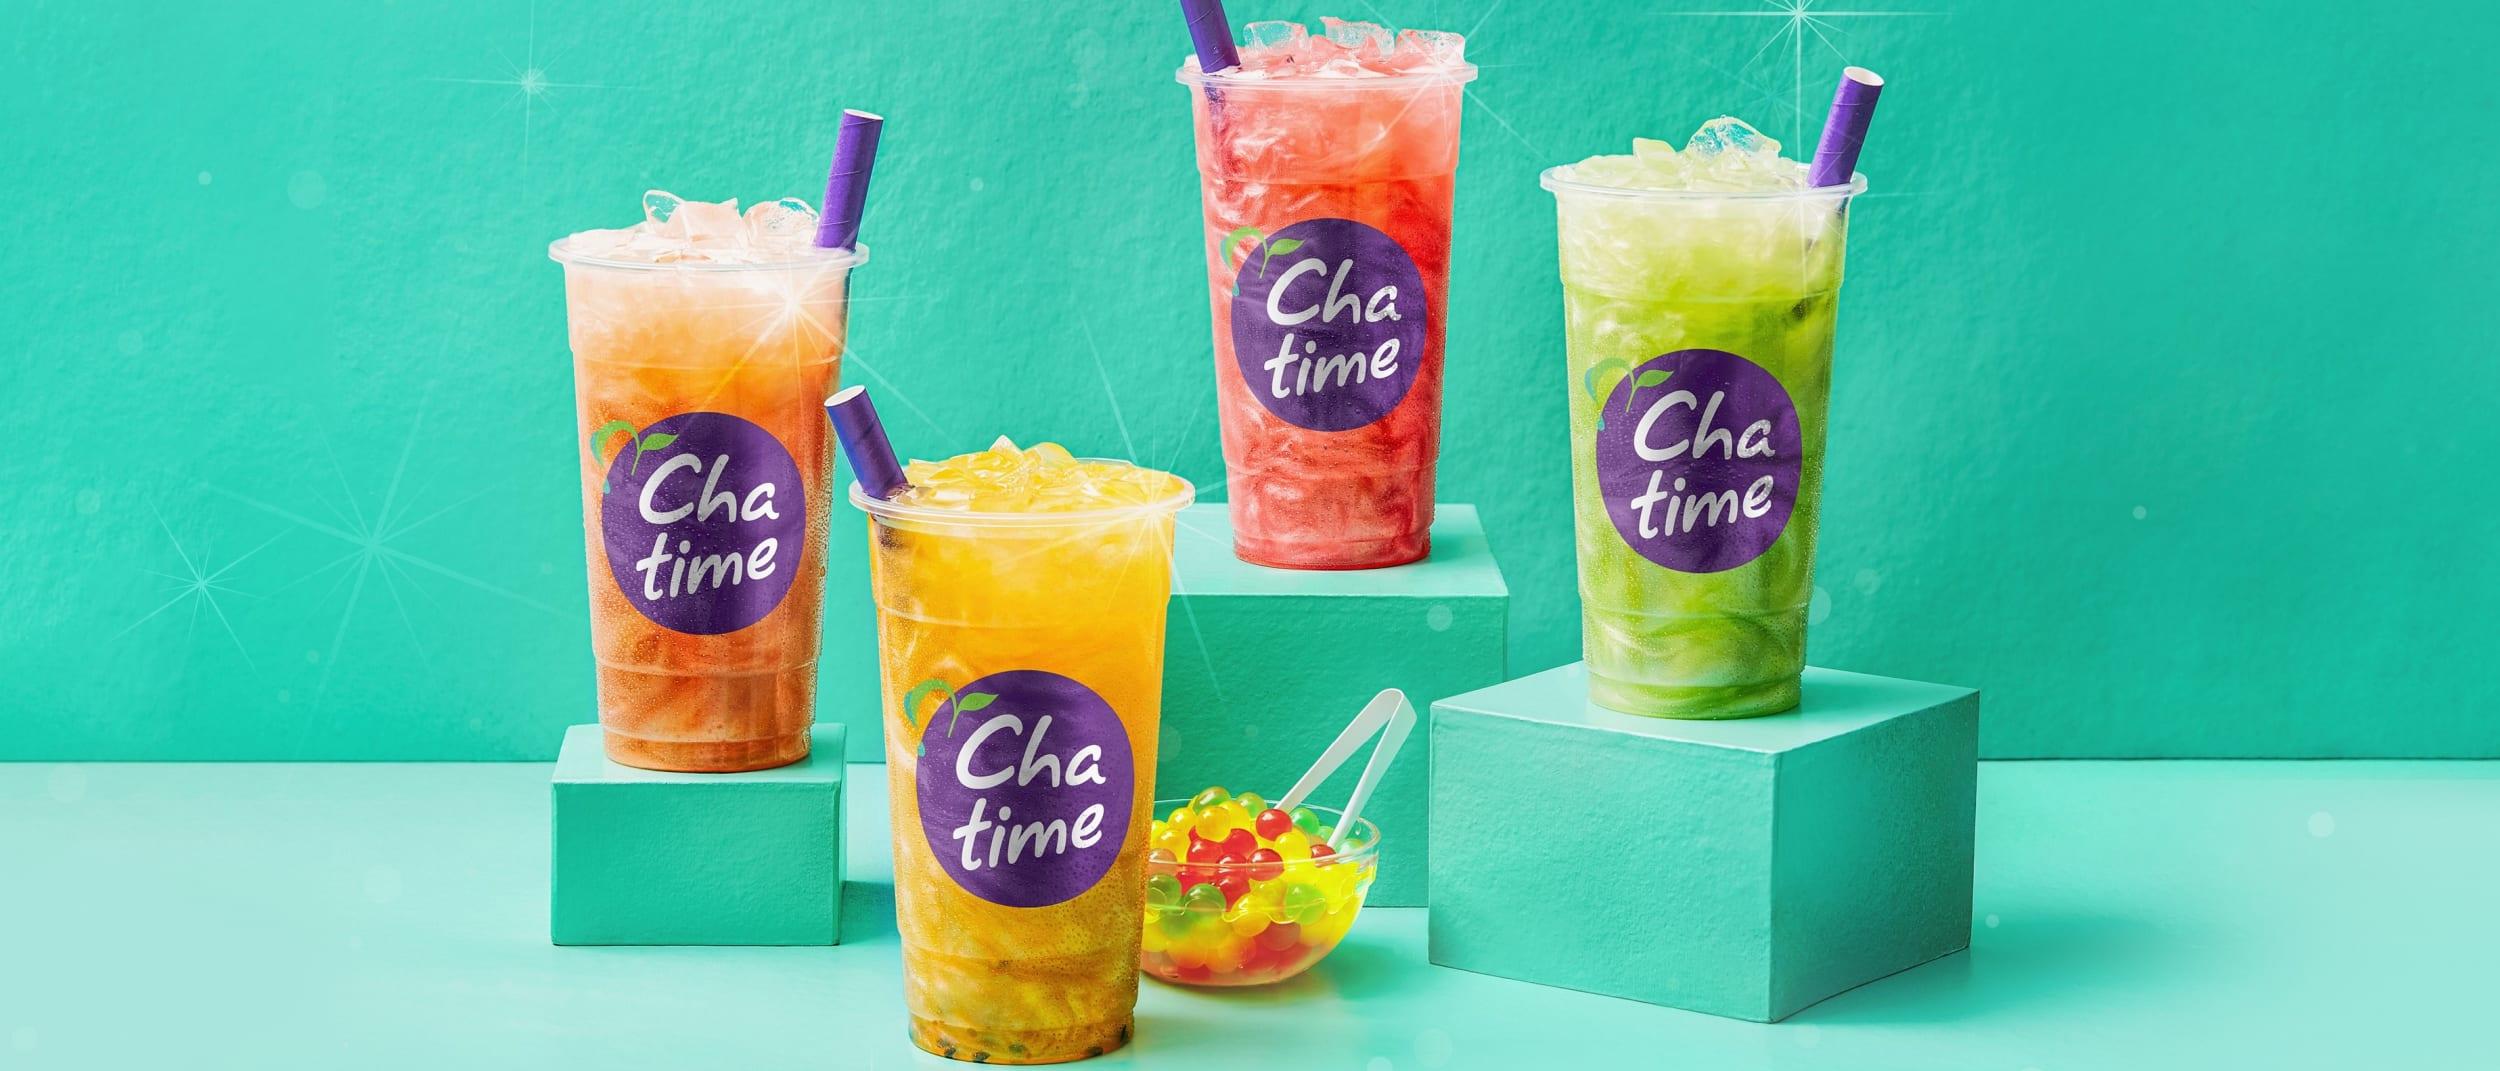 Chatime: Shimmer Fruity Iced Teas